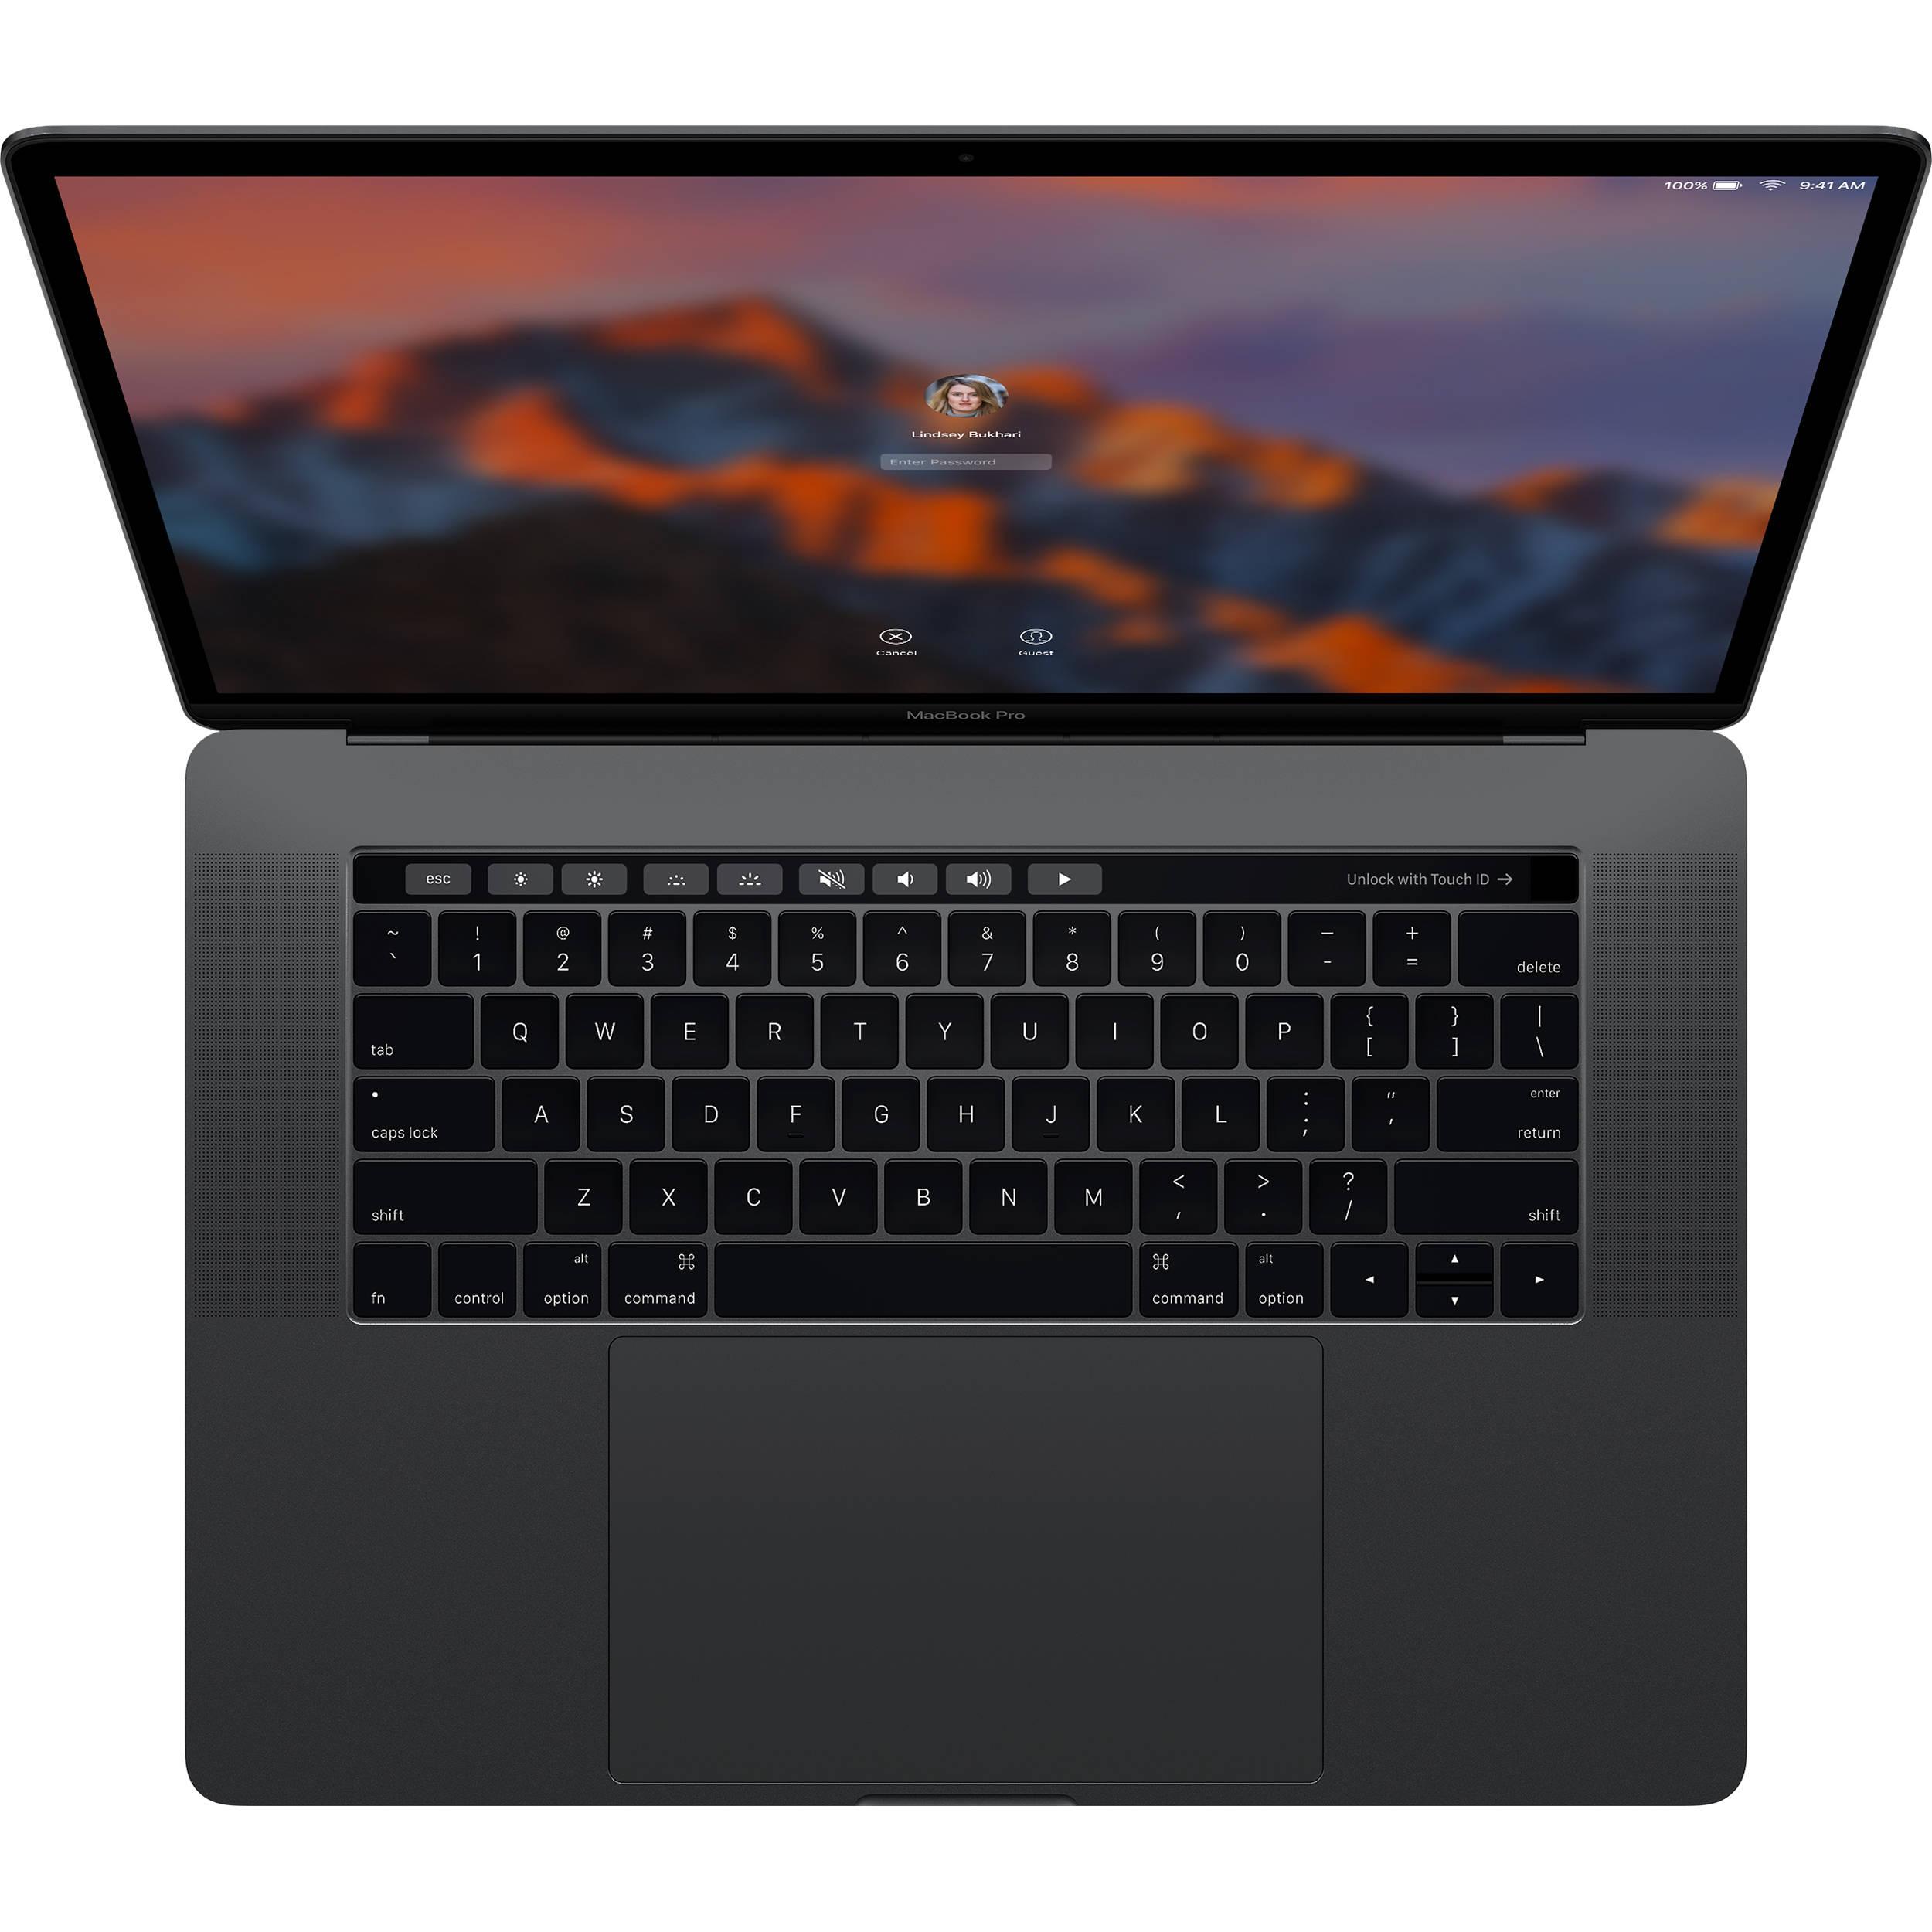 "Apple MacBook Pro 15,4"" Touch Bar/IPS Retina 2880x1800/QC i7 2.8-3.8GHz/16GB/256GB_SSD/R Pro 555_2GB/CZ/Space Gray"